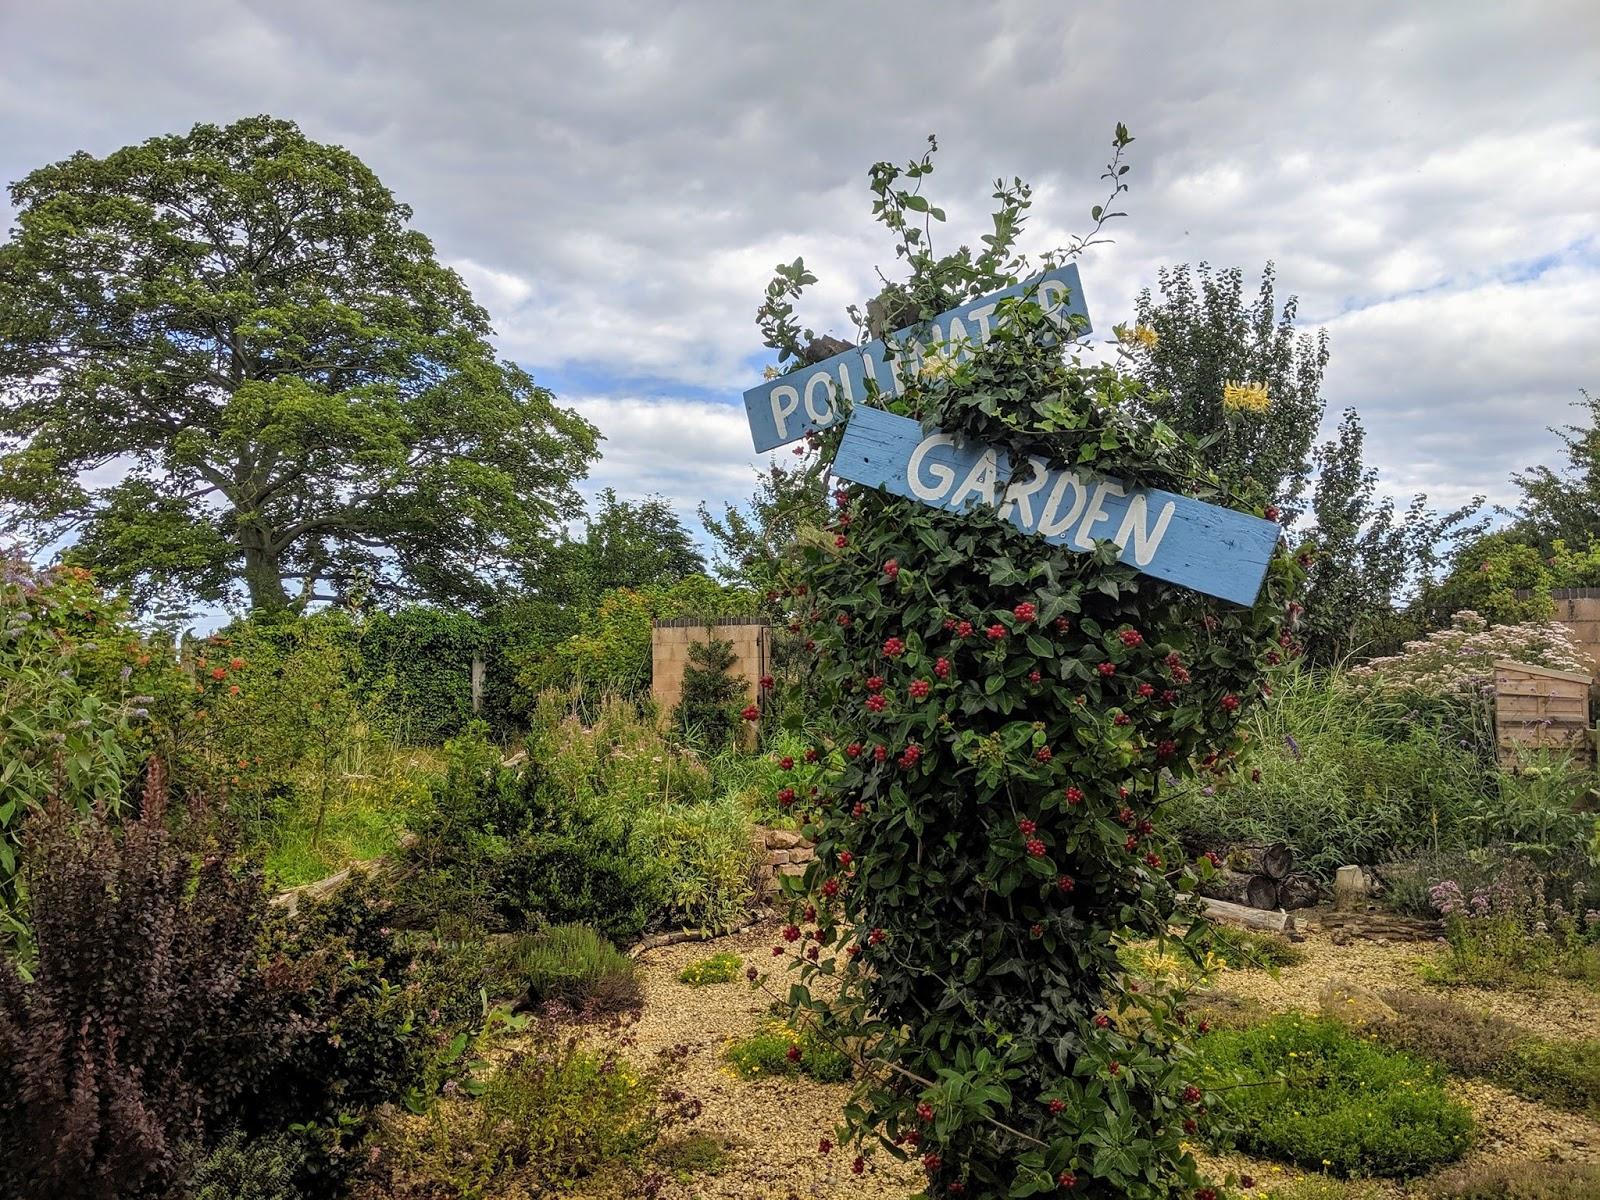 10 North East Hidden Gems to Visit this Year - RSPB Saltholme